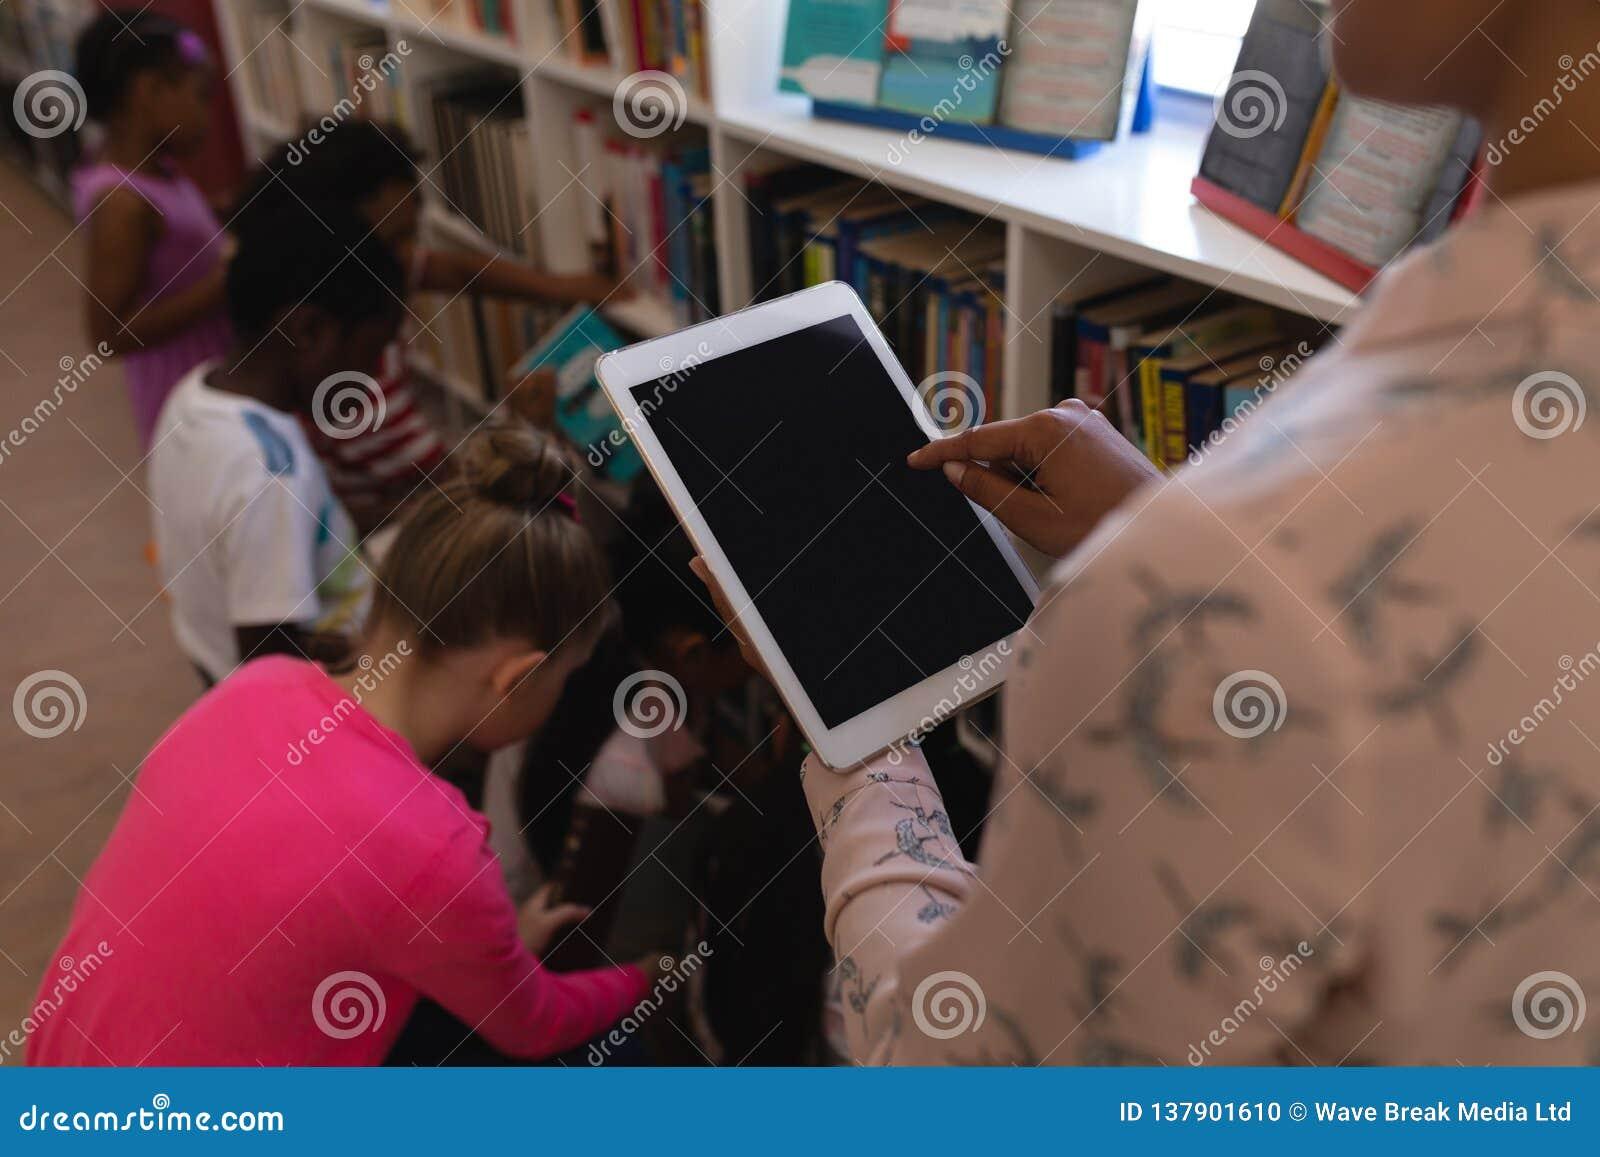 Female teacher working on digital tablet in school library